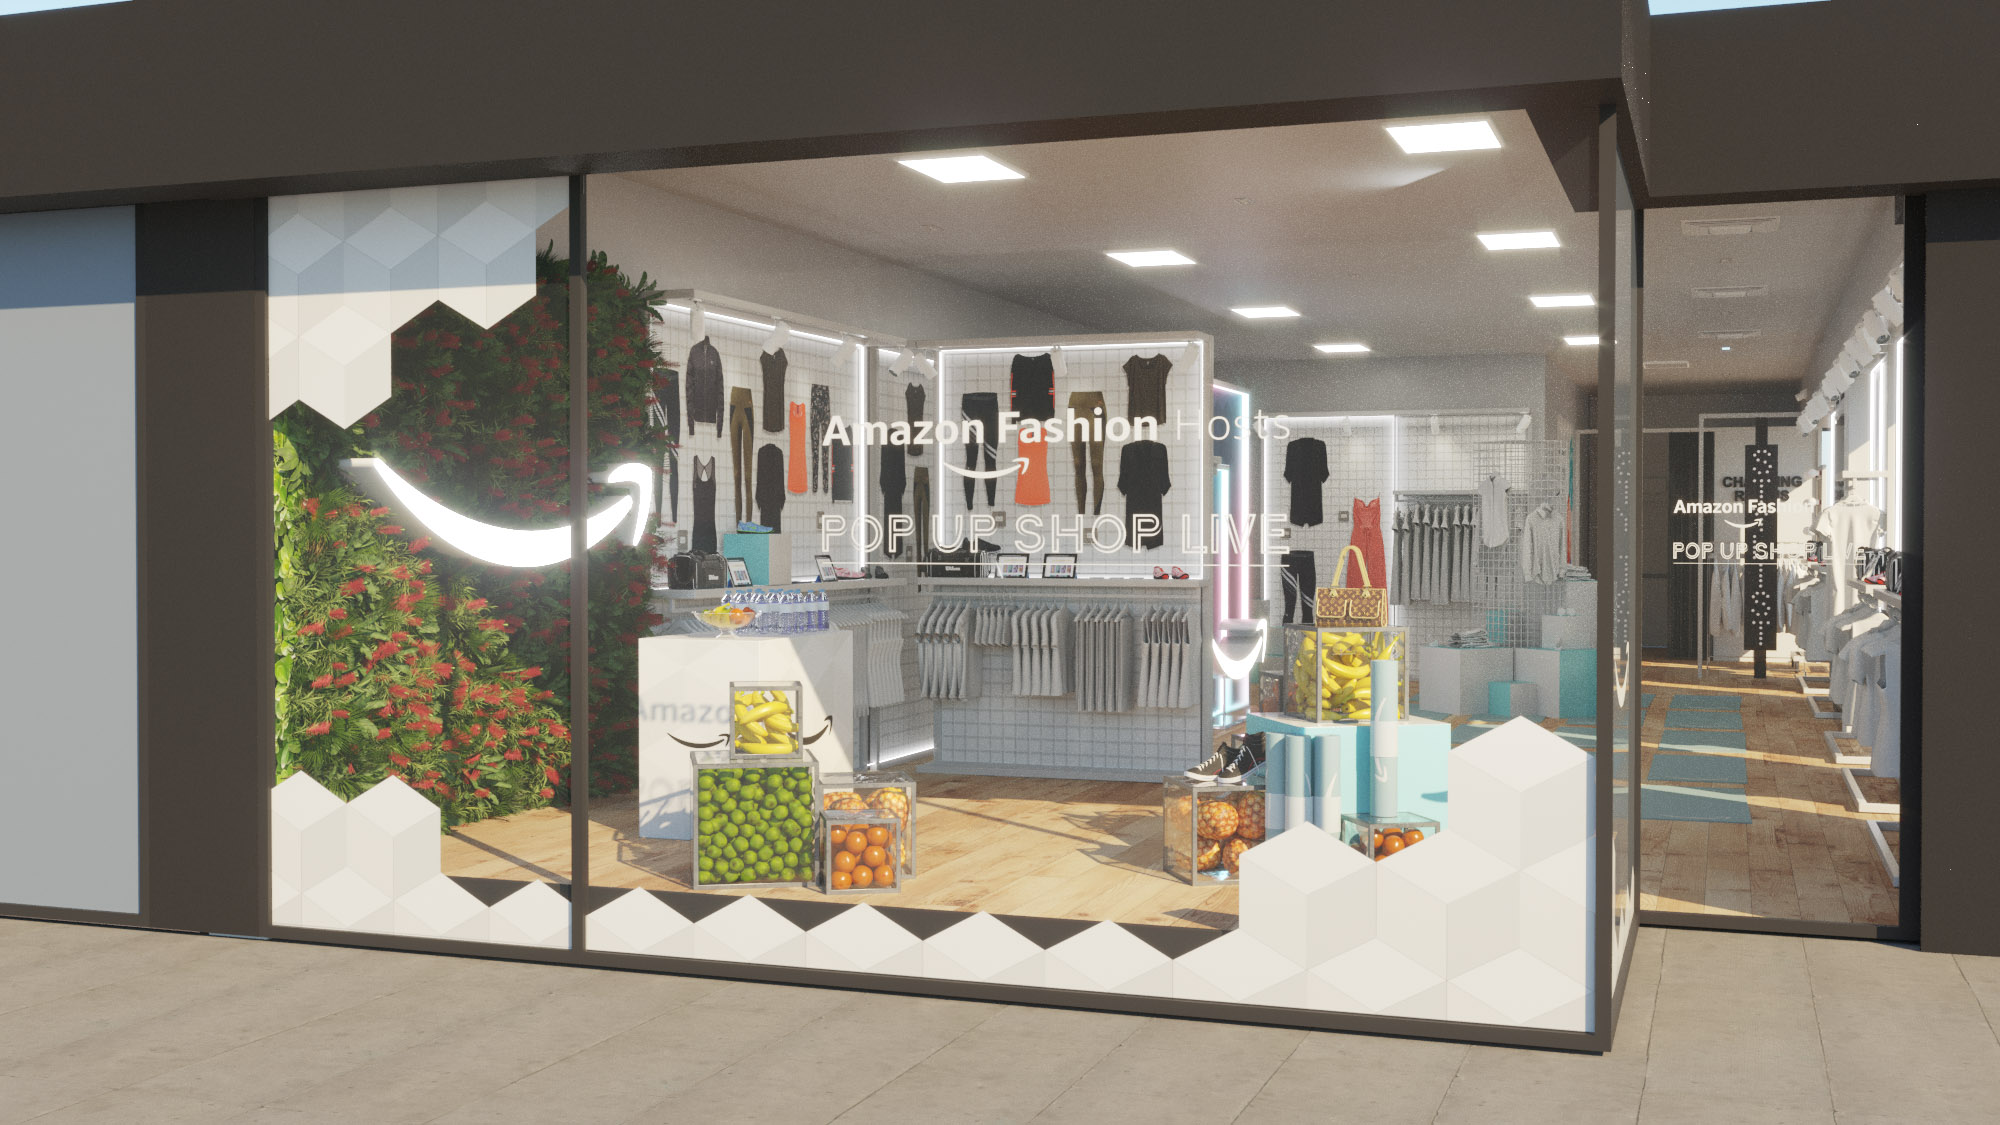 Hints Retail Further London Fashion At Ambitions Amazon's Pop Up oerdCWxB